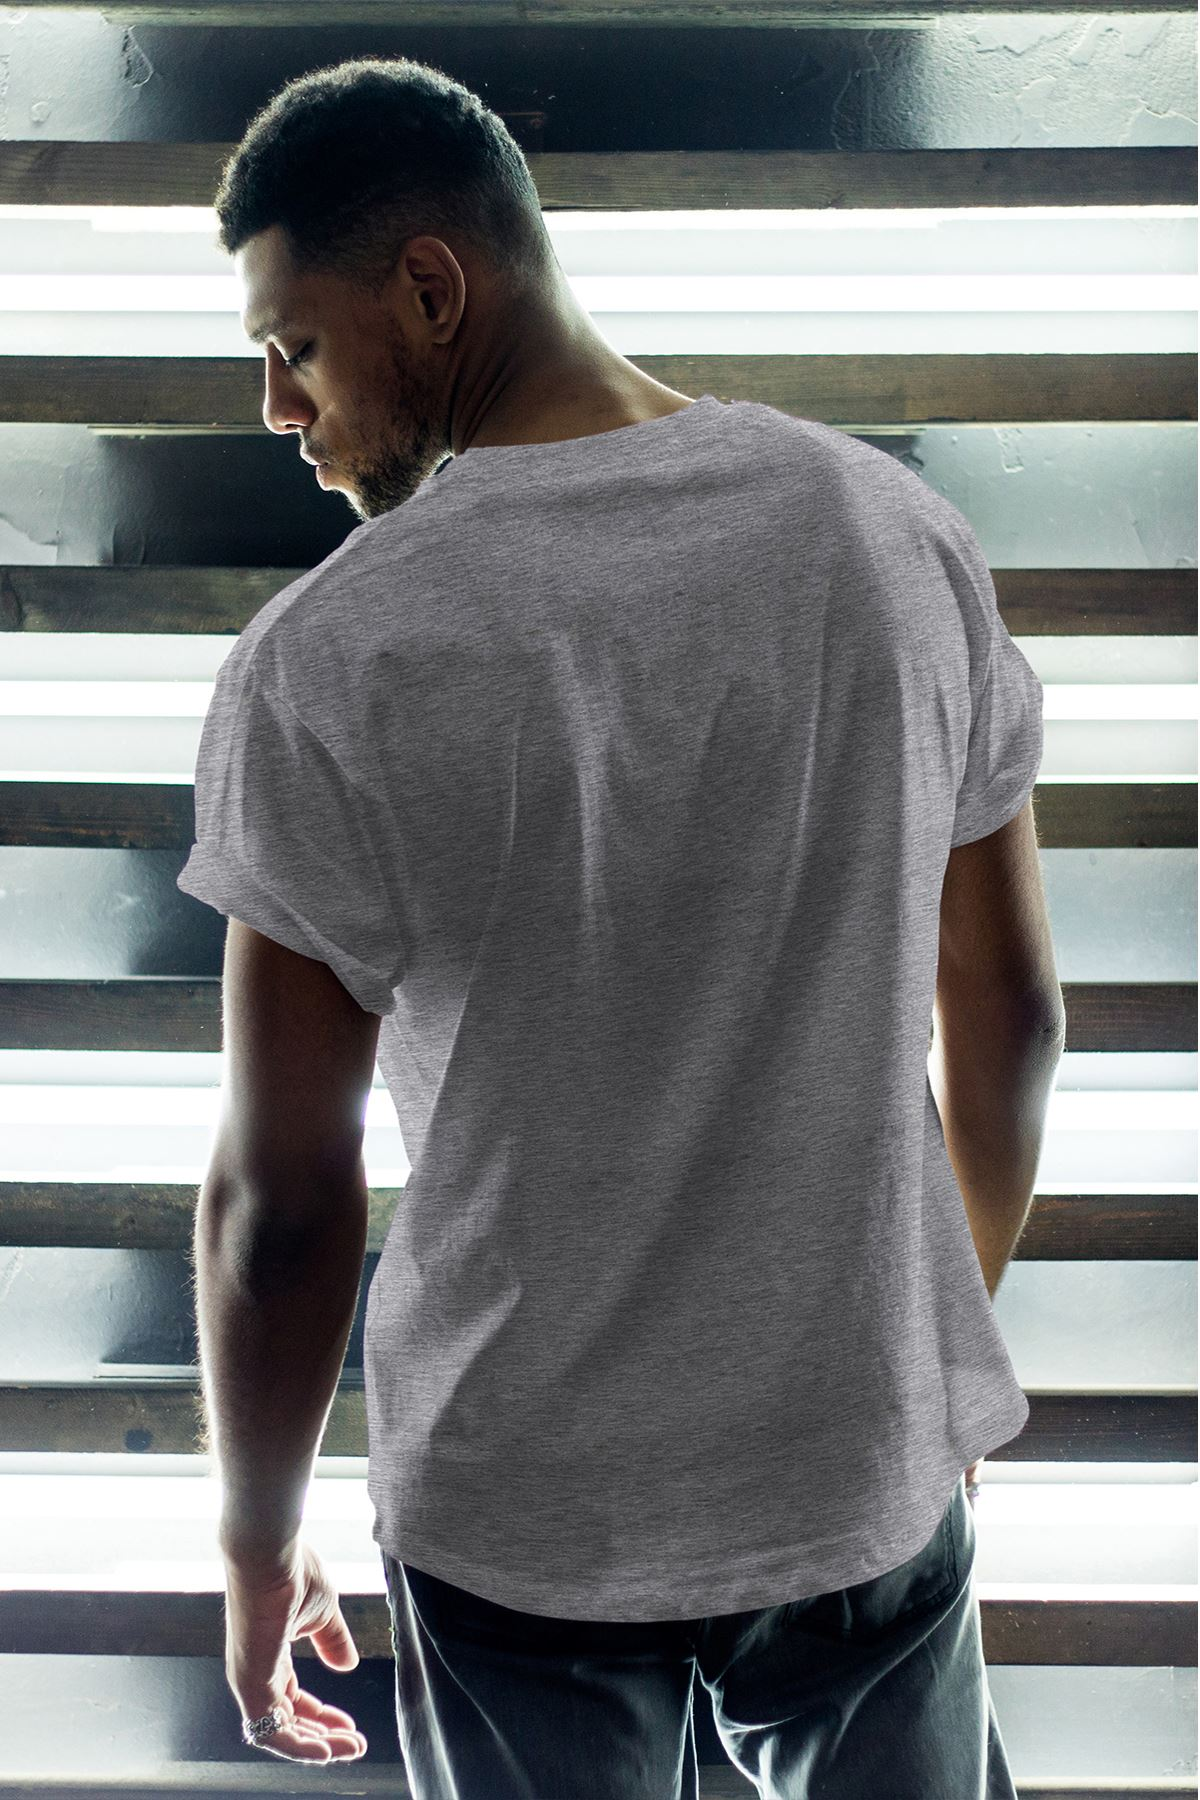 Chicago Bulls 37 Gri Erkek Oversize Tshirt - Tişört